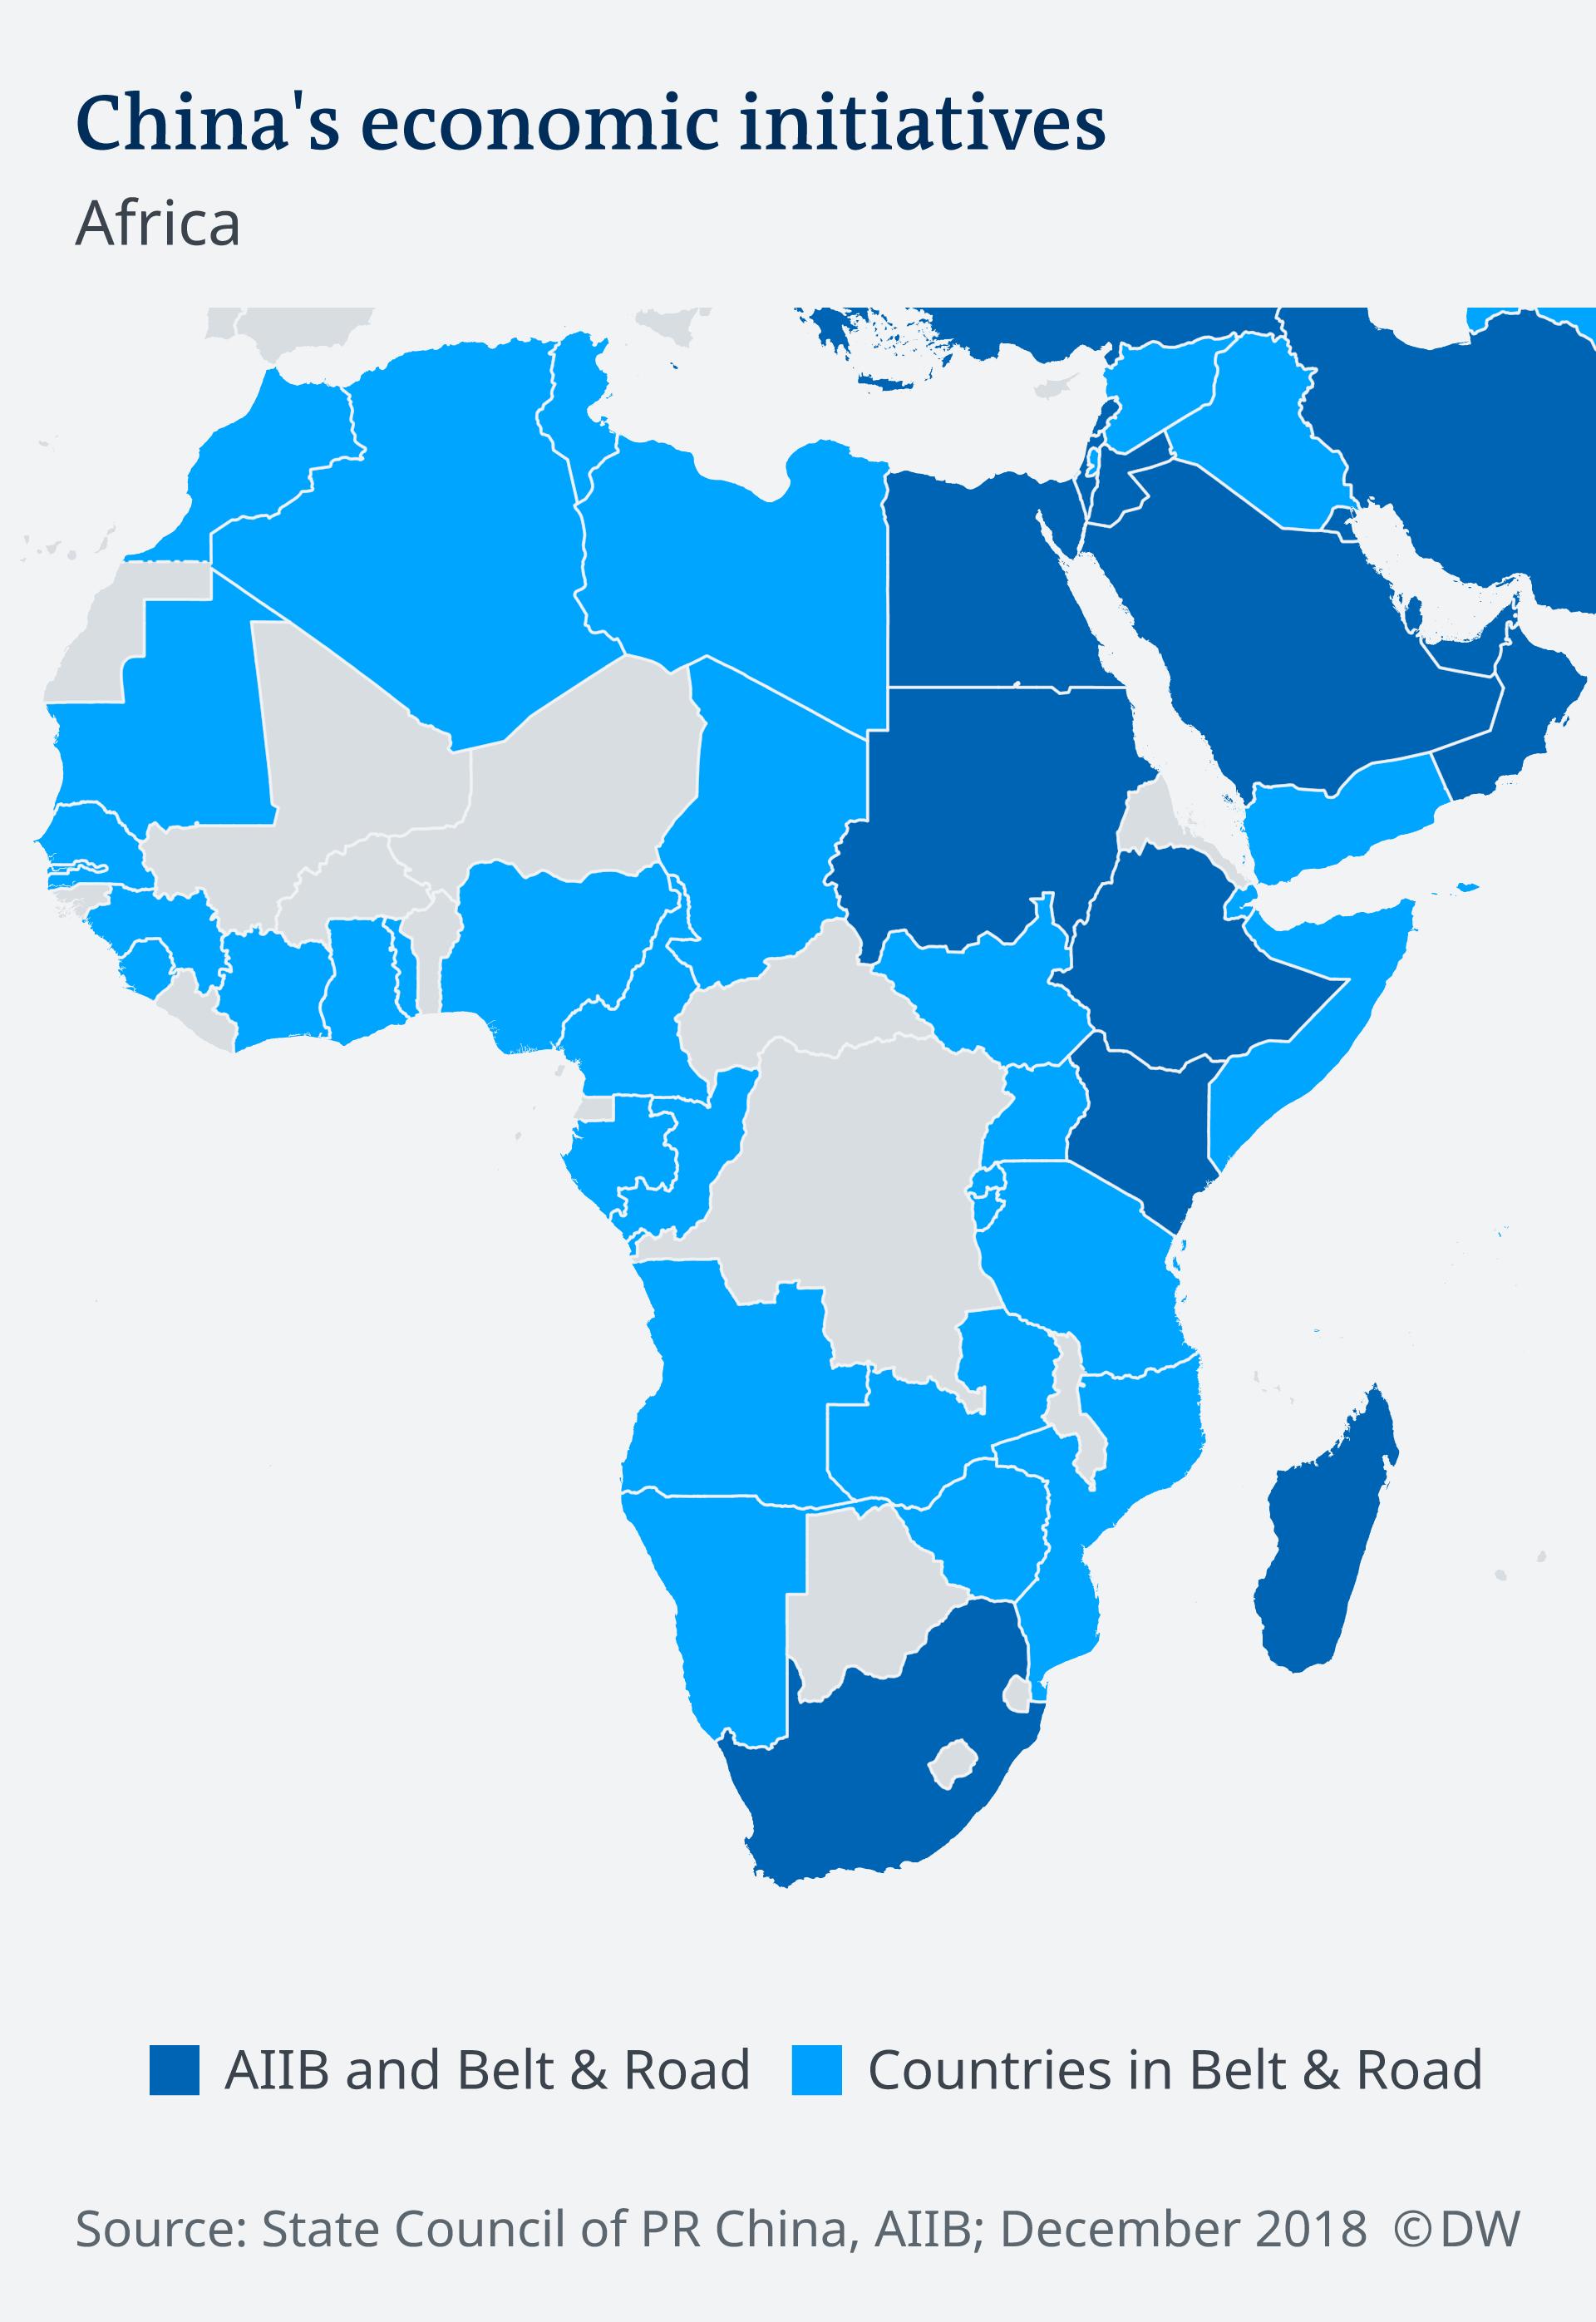 China′s Belt and Road forum: does Africa need new funding options on kenya route map, kenya tourist map, limuru kenya map, kenya country map, kenya equator, kenya police map, kenya thematic map, kenya map detailed, kenya flag, kenya coast map, kenya animals, kenya map regions, kenya vegetation map, kenya travel map, kenya topographical map, kenya points of interest, kenya counties list, kenya town map, kenya africa map,